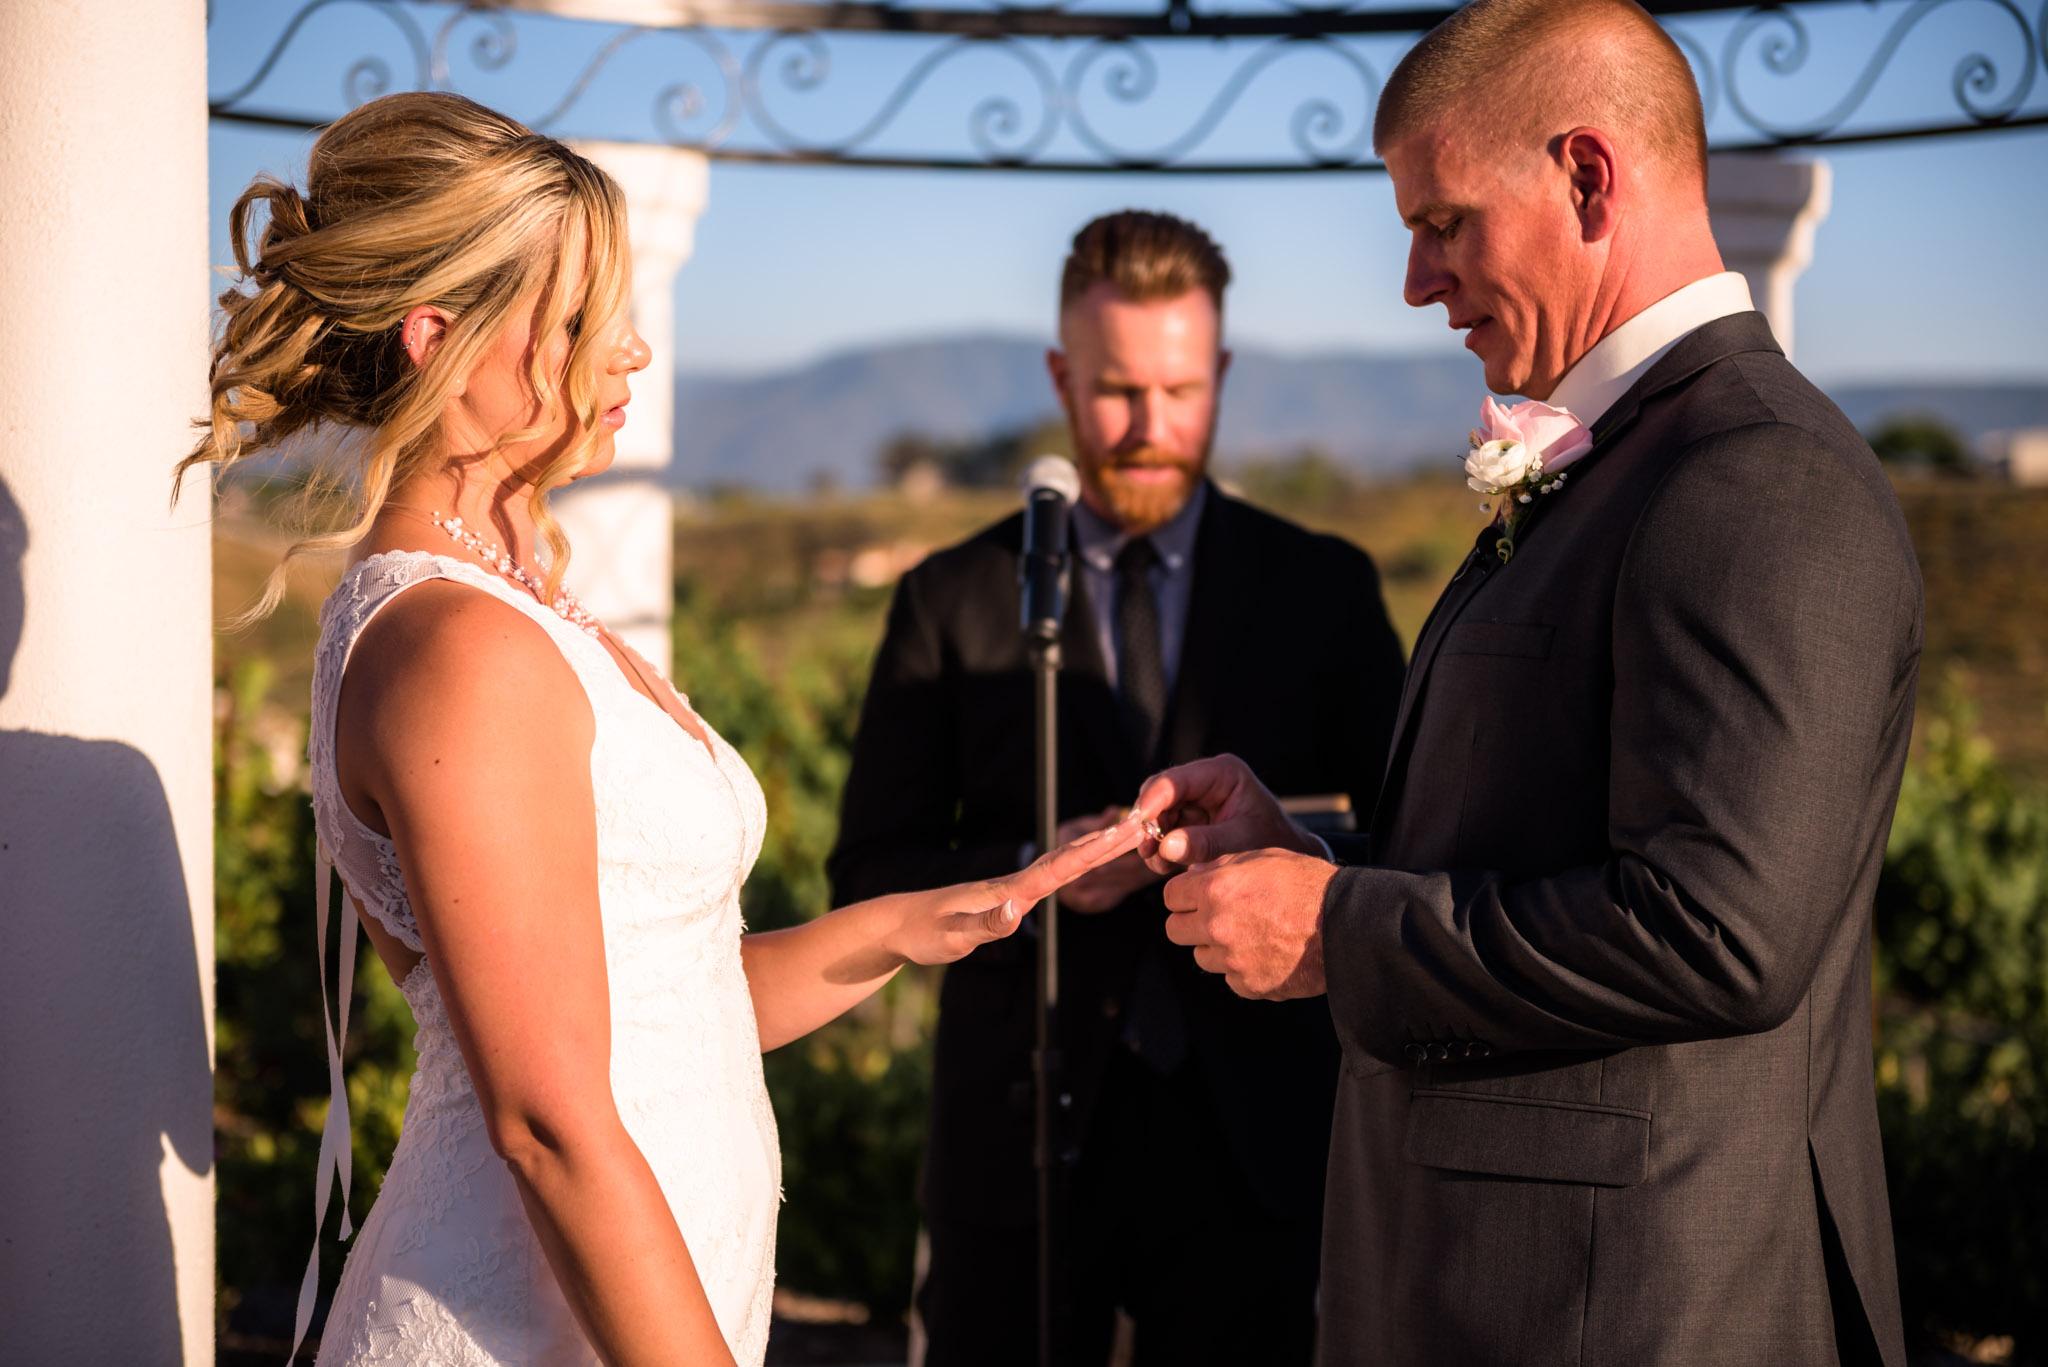 Avensole-Winery-Temecula-Wedding-Josh-and-Olivia-3590.JPG